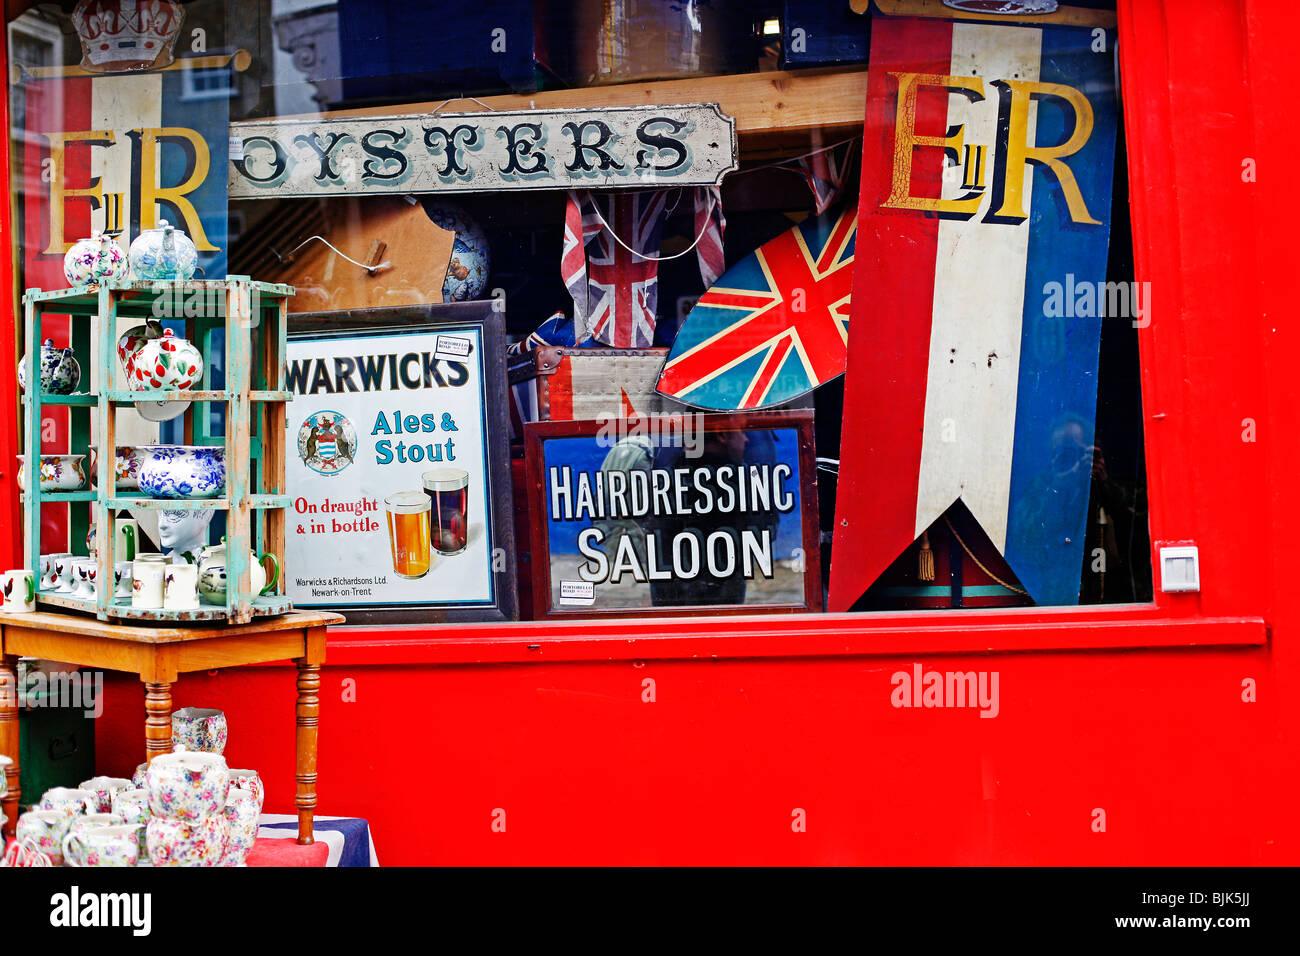 A colorful or colorful antique or junk  shop in Portobello Road, London - Stock Image